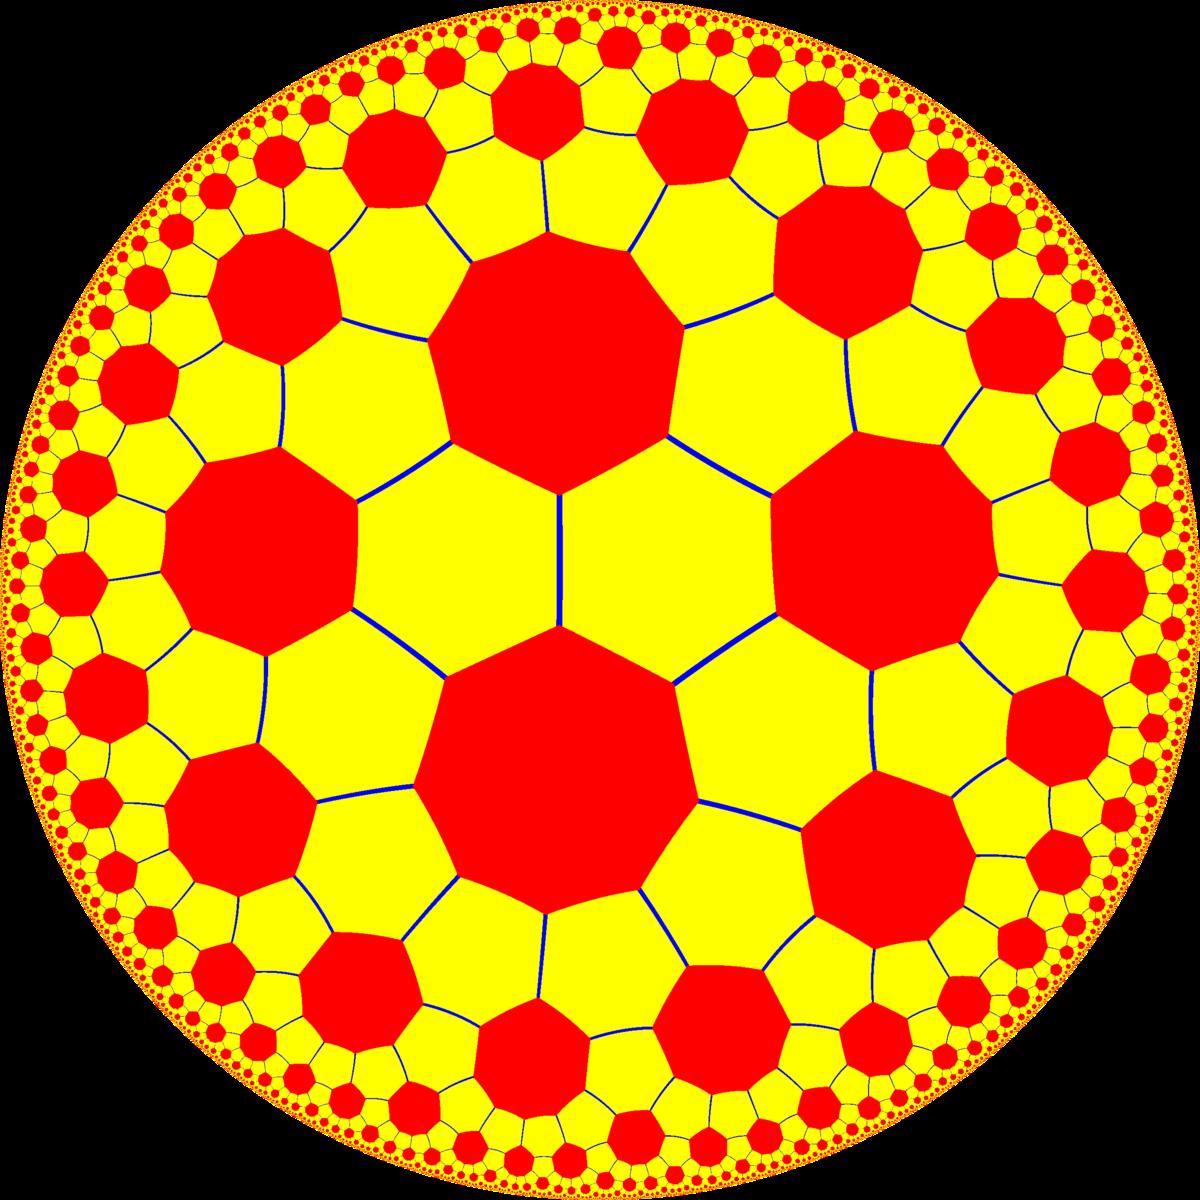 truncated order 8 triangular tiling   wikipedia